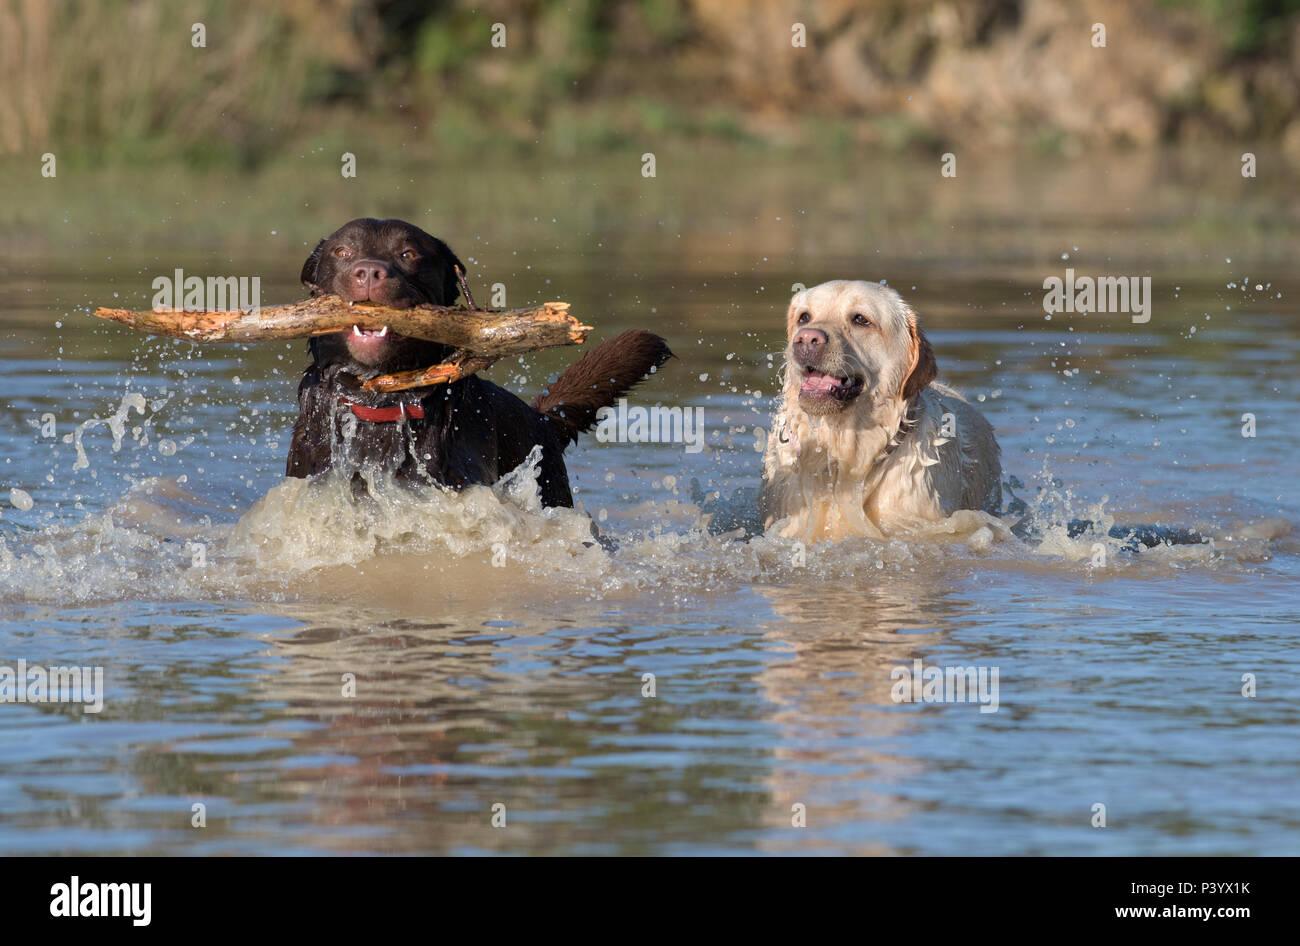 A pair of Labrador Retriever dogs-Canis lupus familiaris play. Uk - Stock Image